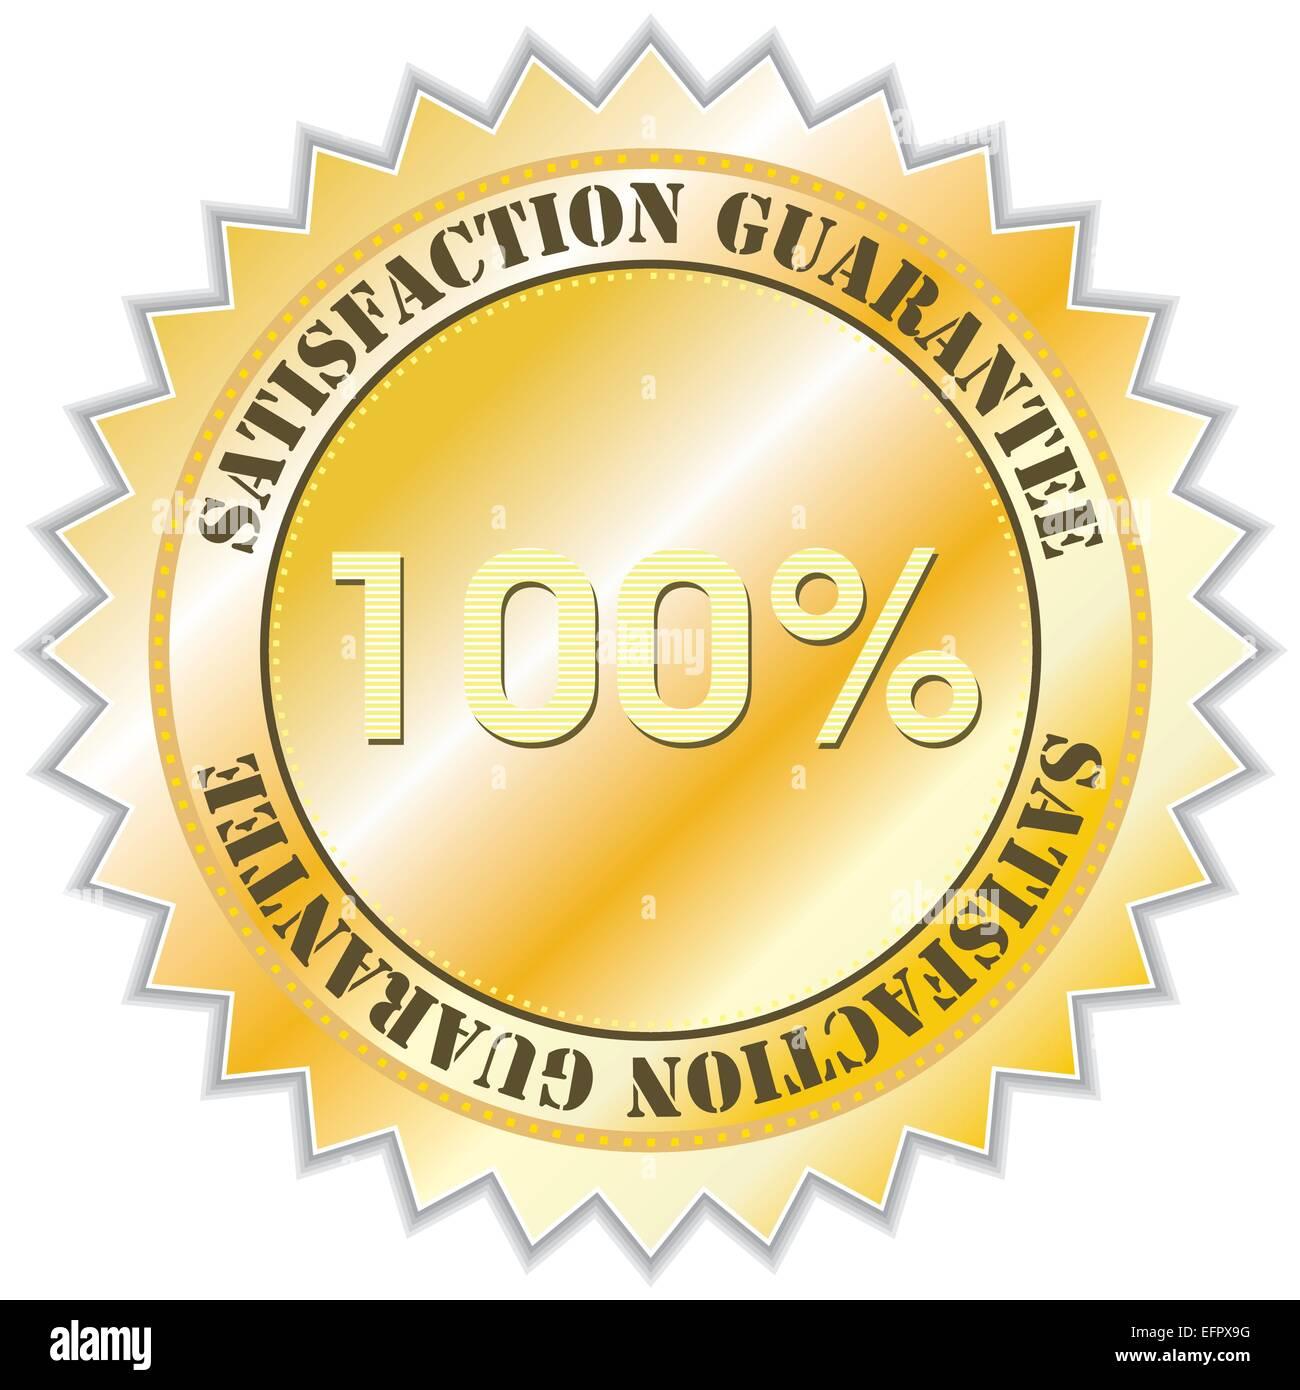 Satisfaction guarantee label, vector illustration - Stock Vector